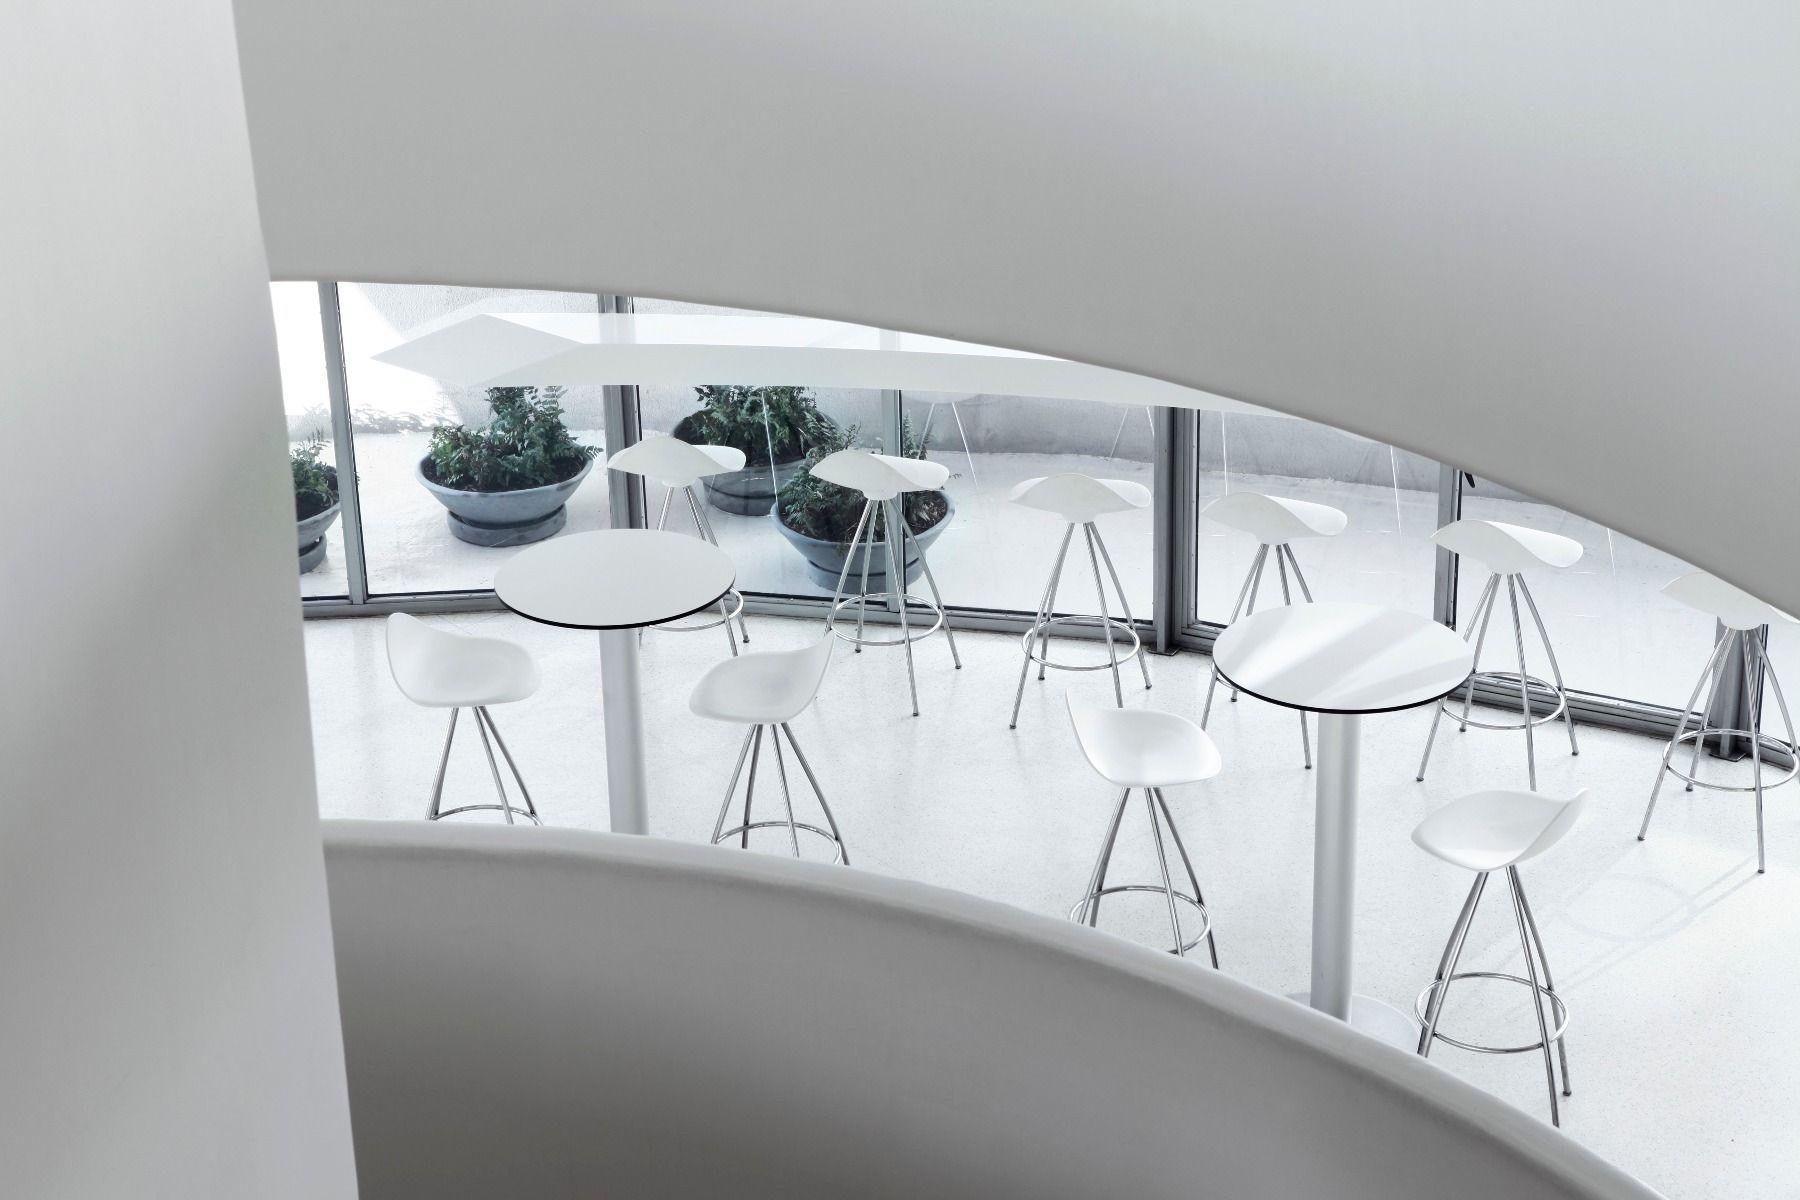 STUA onda swivel monochrome bar stool in the Guggenheim